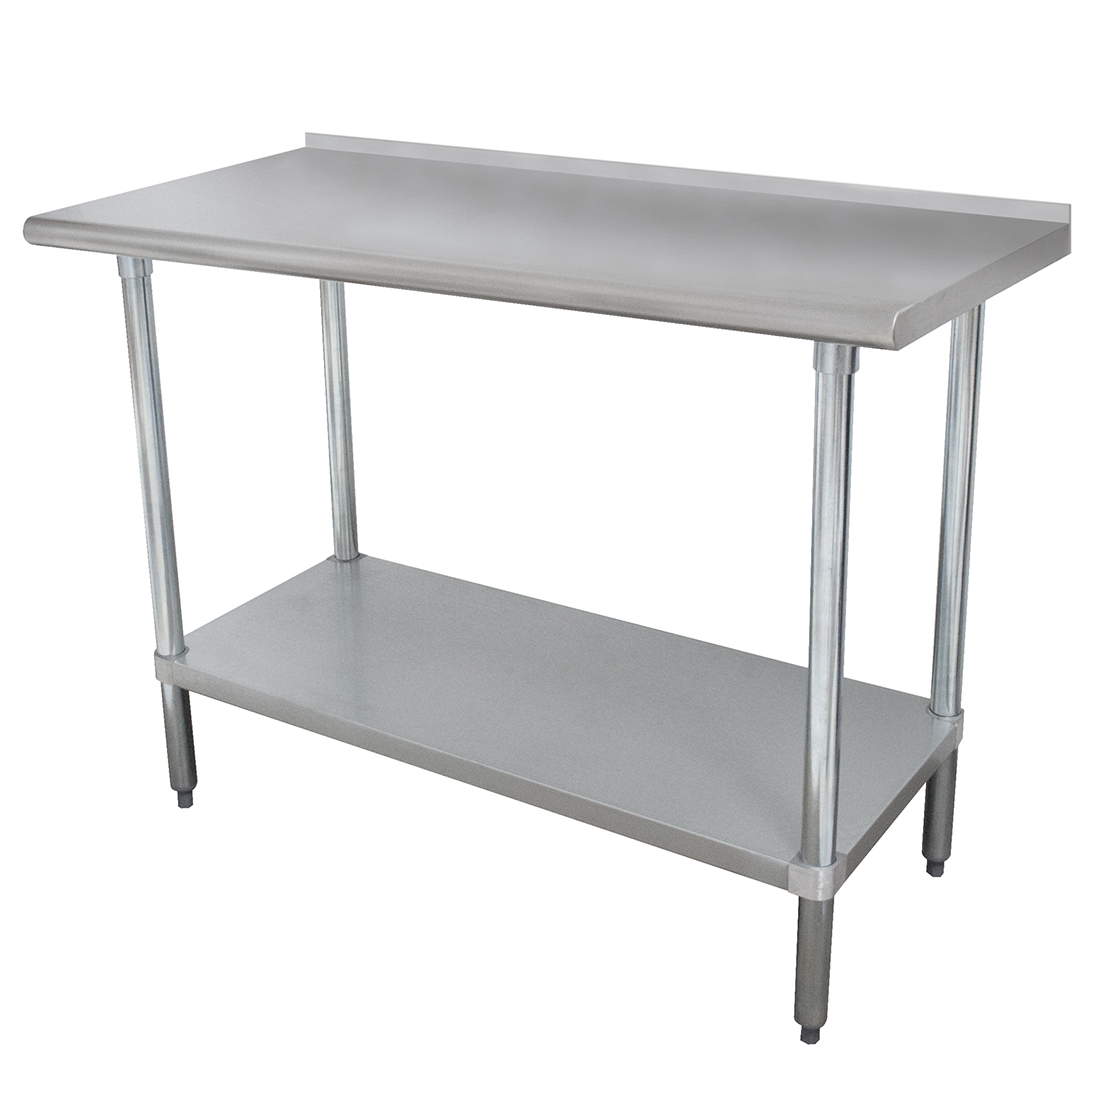 Advance Tabco FSS-245 work table,  54